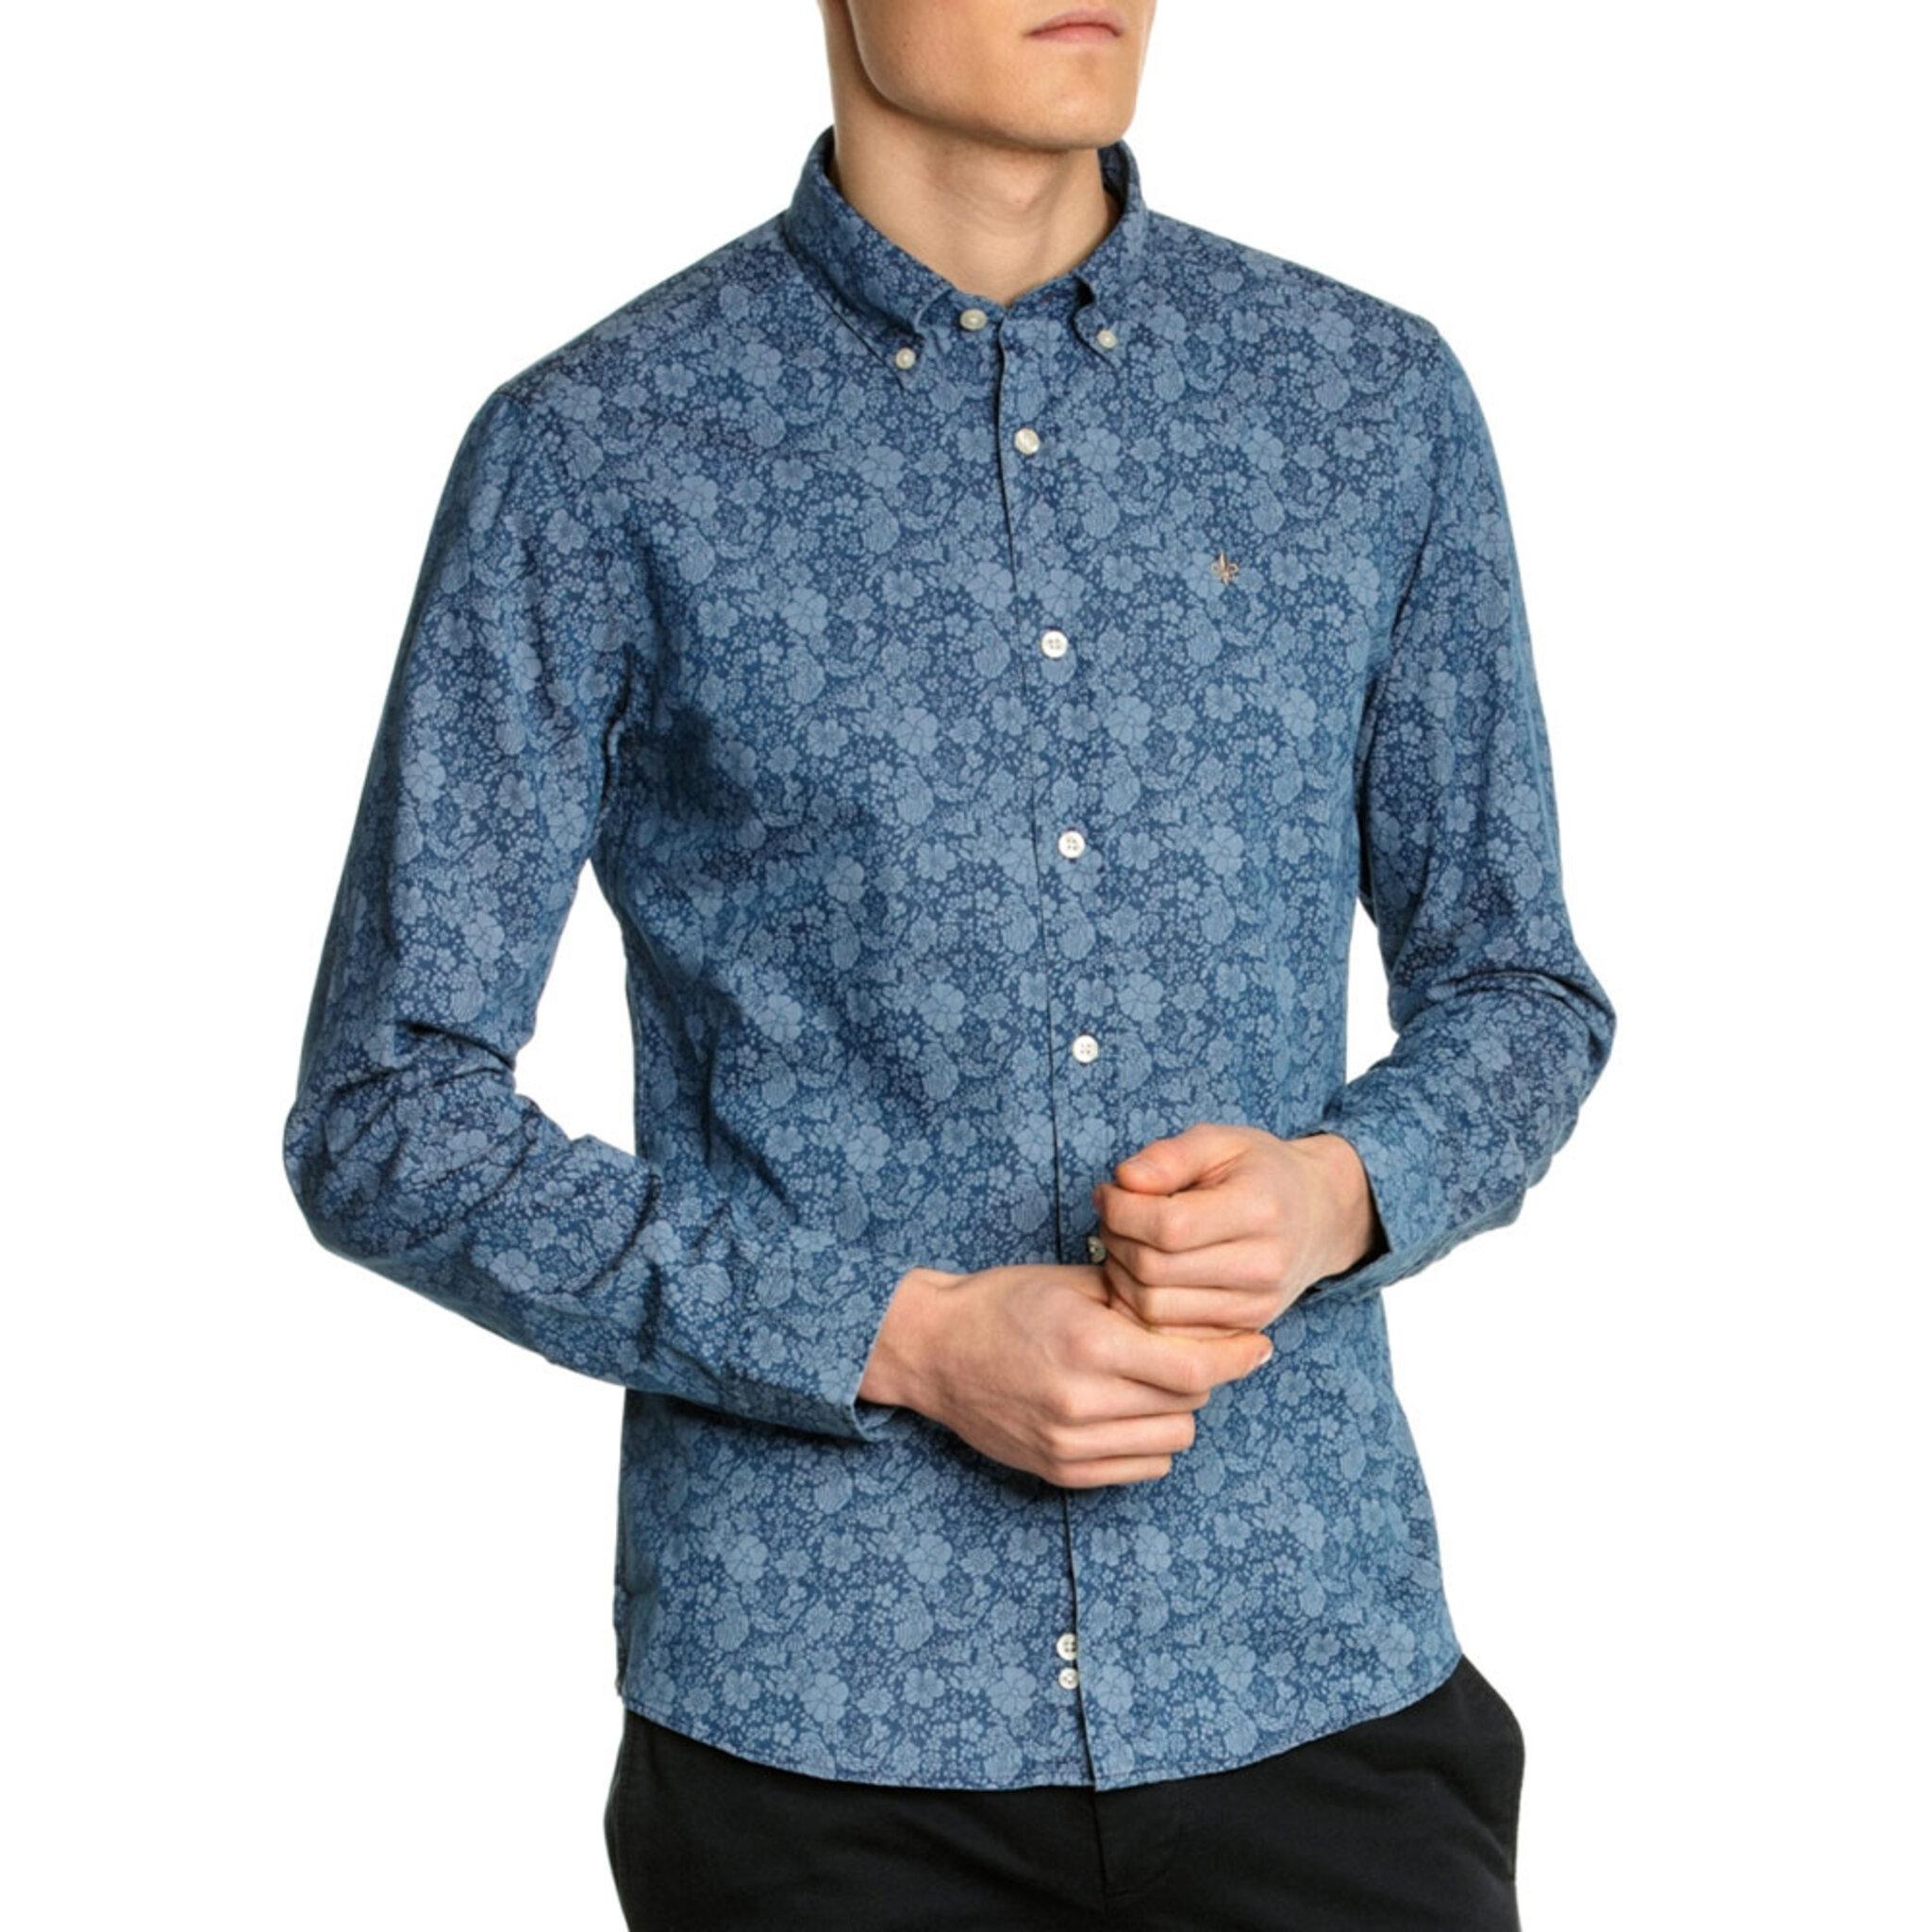 Douglas Indio Shirt